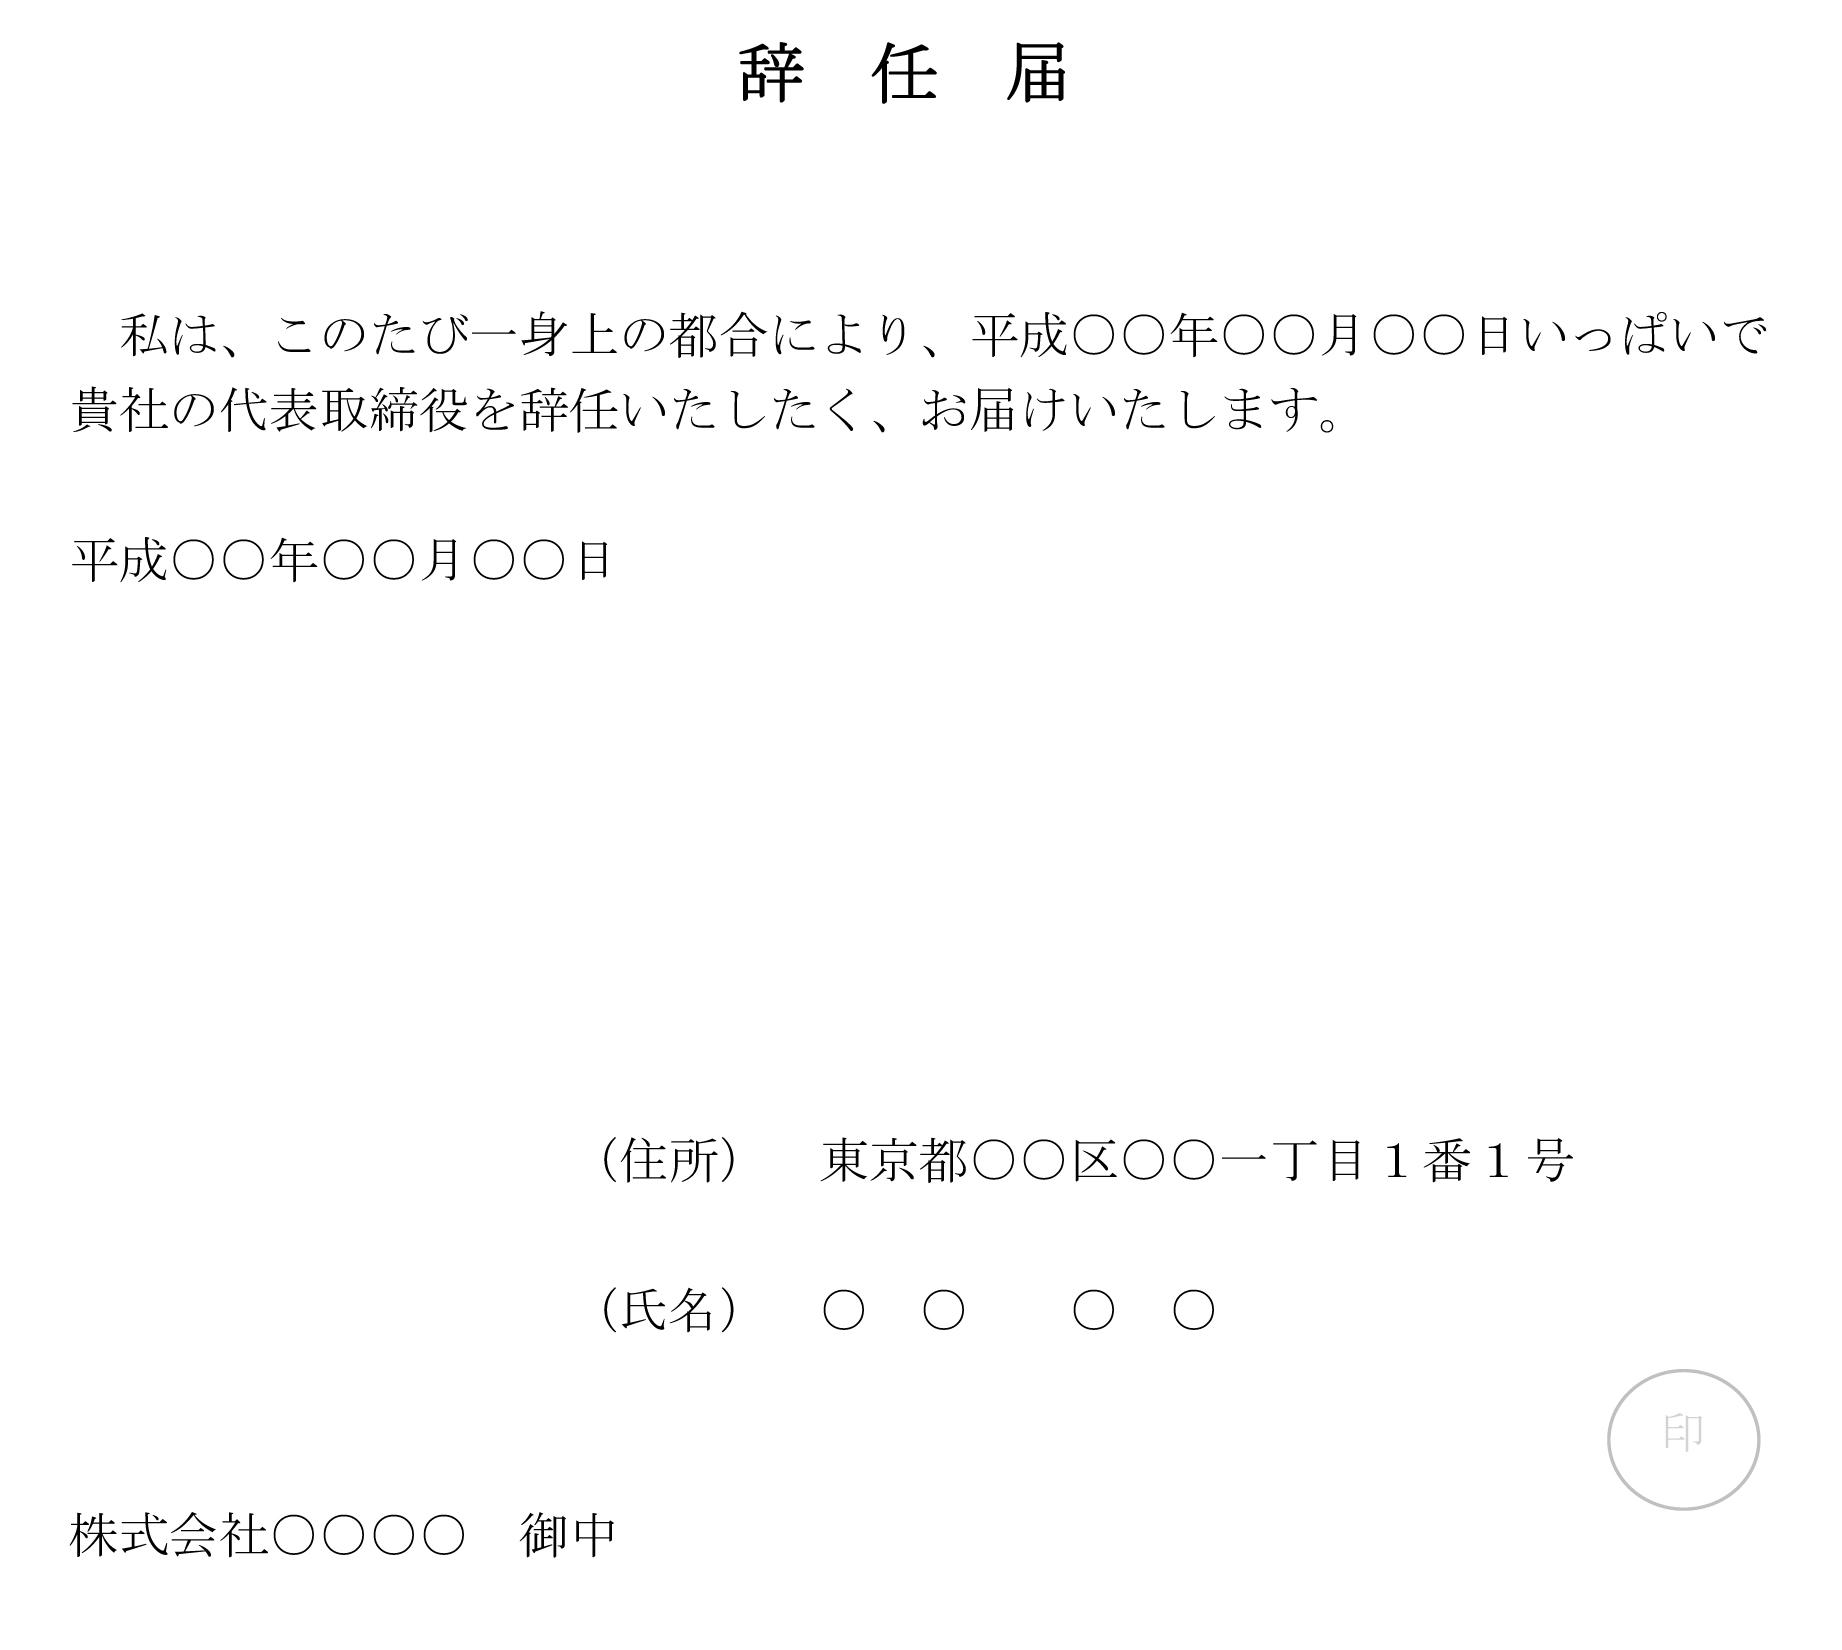 辞任届(代表取締役) – テンプ...